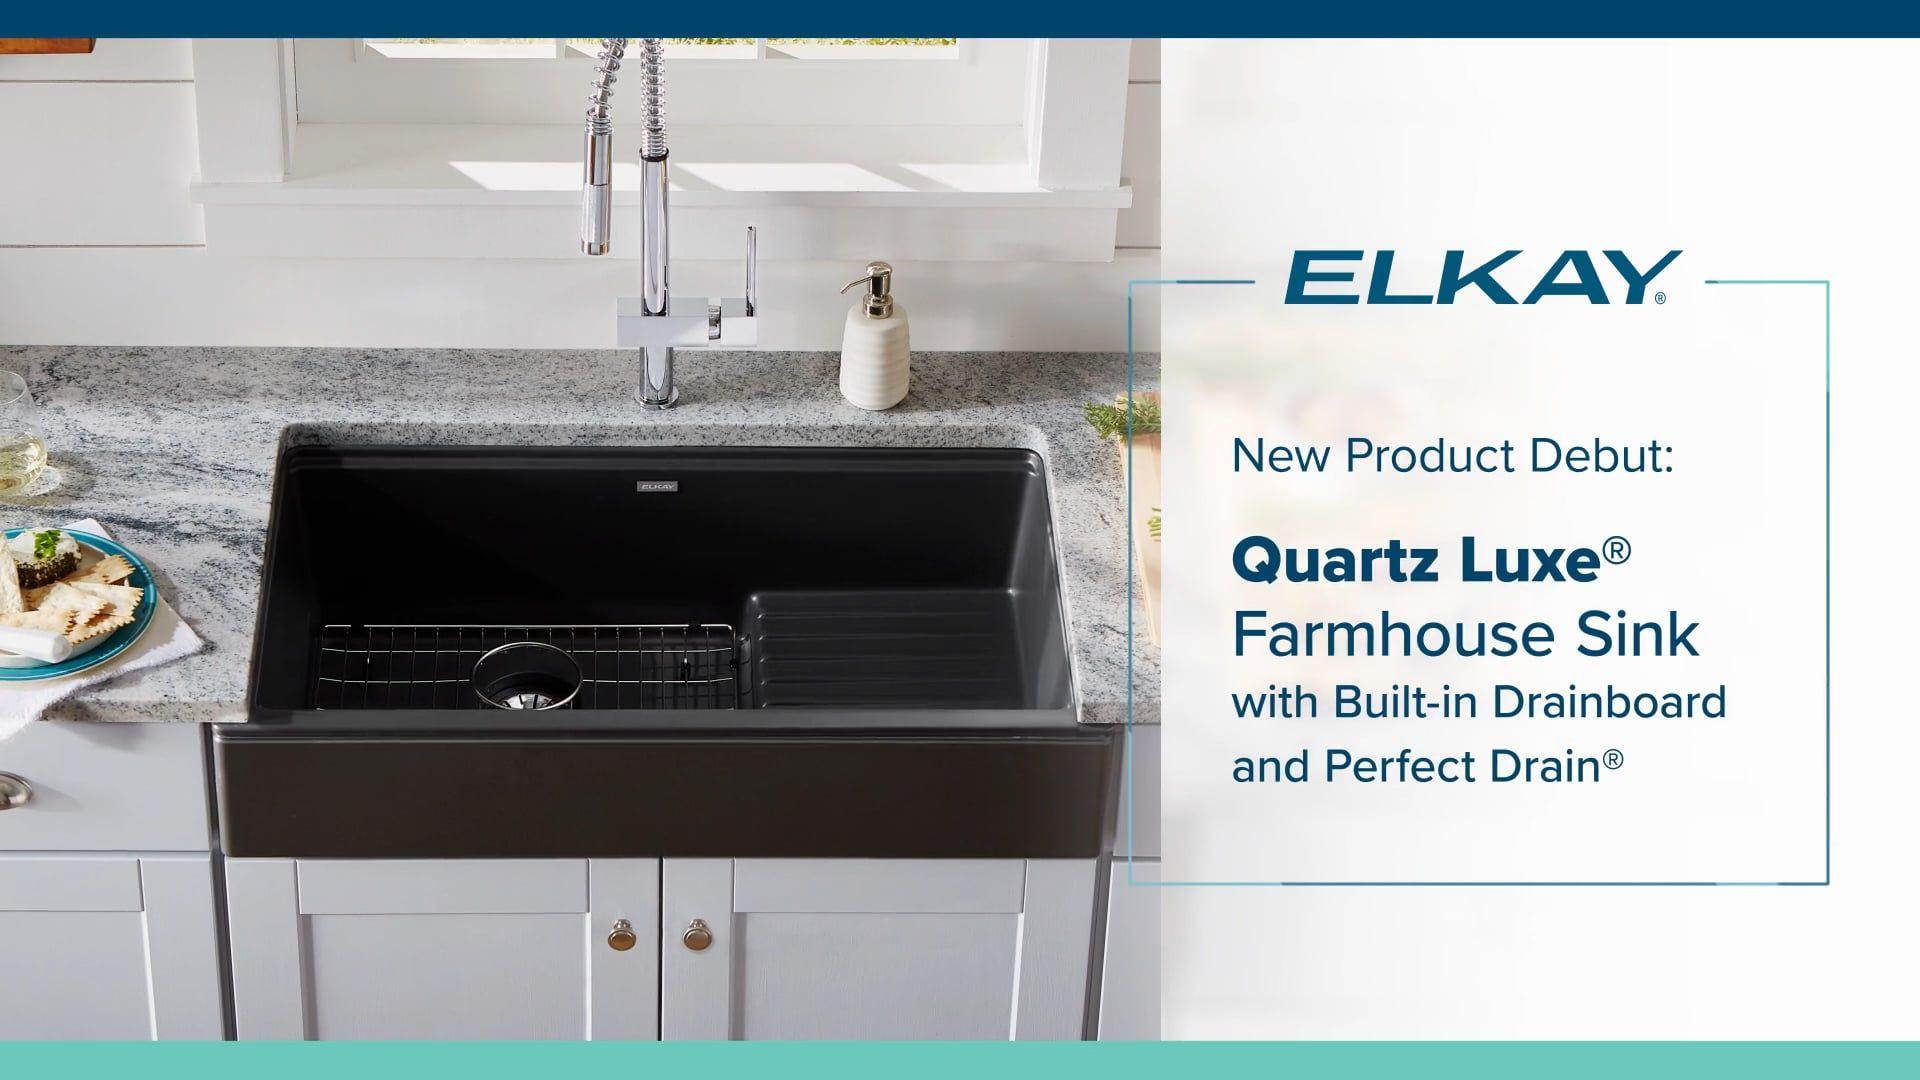 1549792 Spotlight Jan 2019 Dec 2020 Elkay 1080 In 2020 With Images Elkay Farmhouse Sink Double Wall Oven